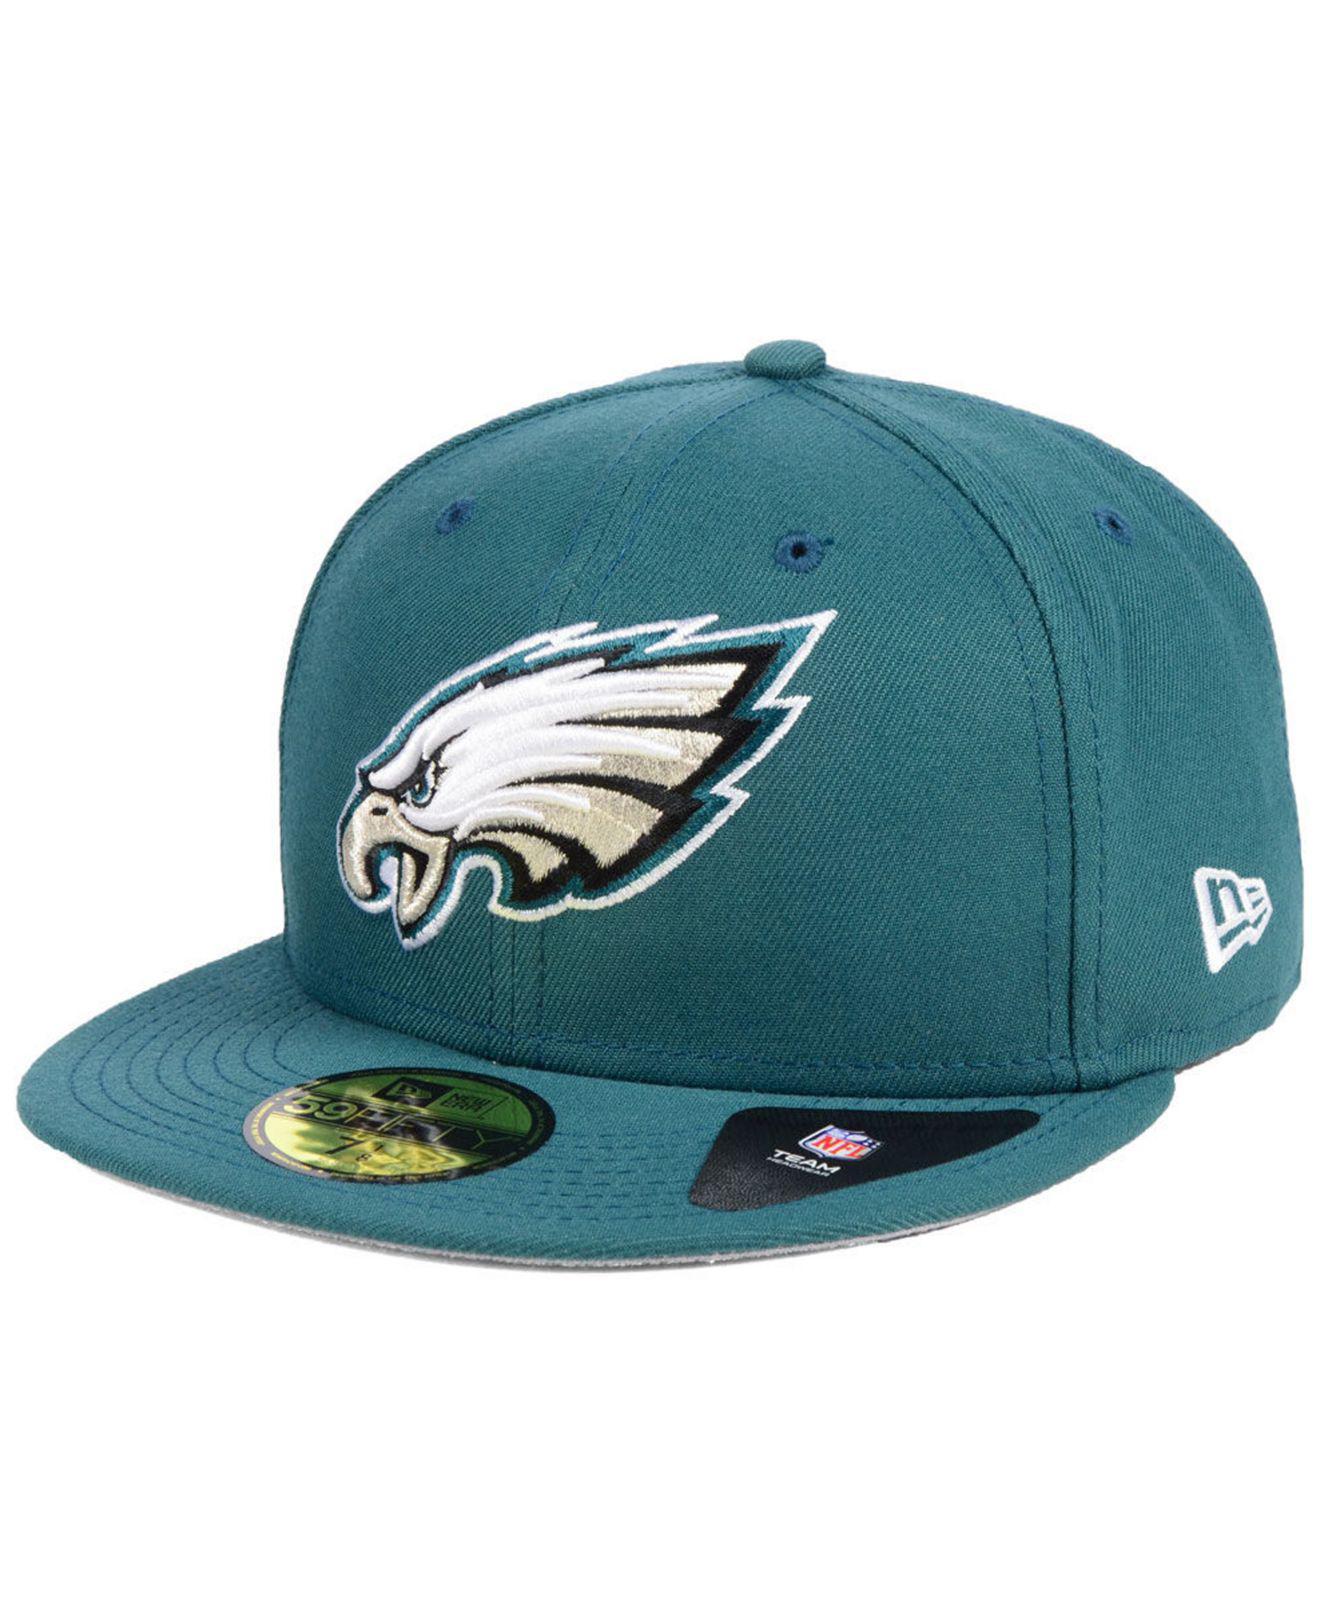 12994593b3c Lyst - Ktz Philadelphia Eagles Team Basic 59fifty Fitted Cap in ...